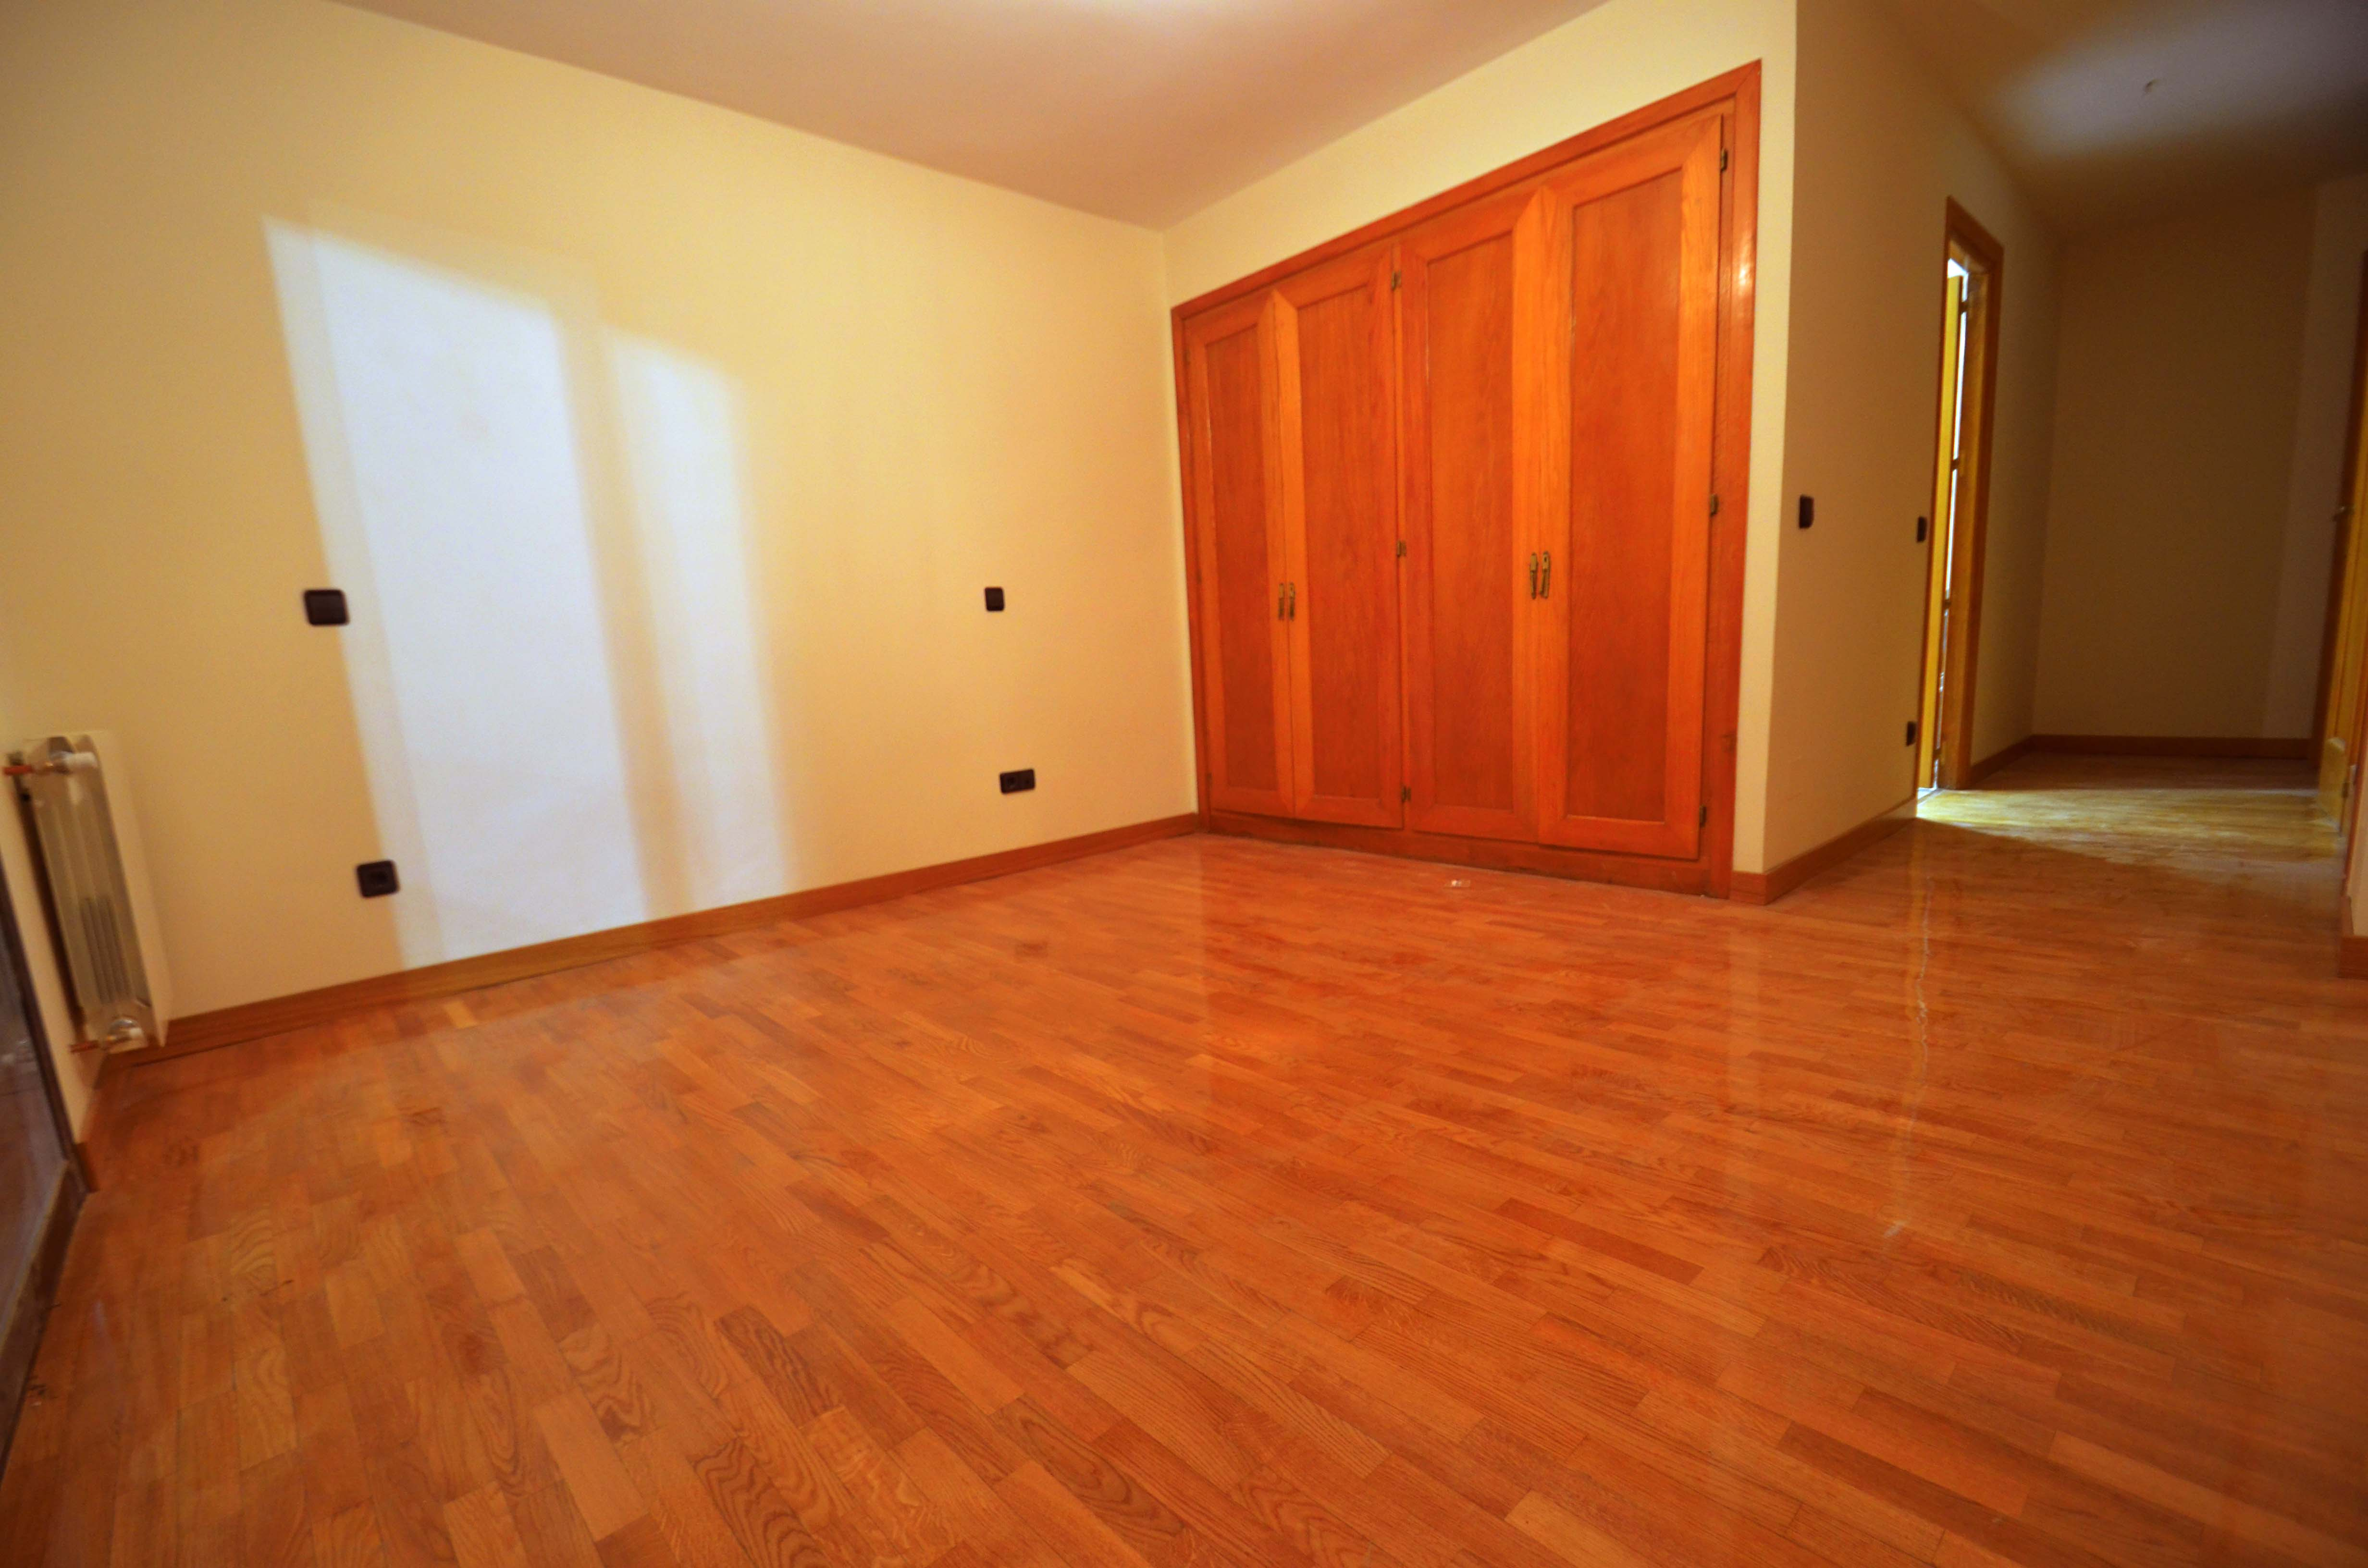 Habitación suelo madera natural